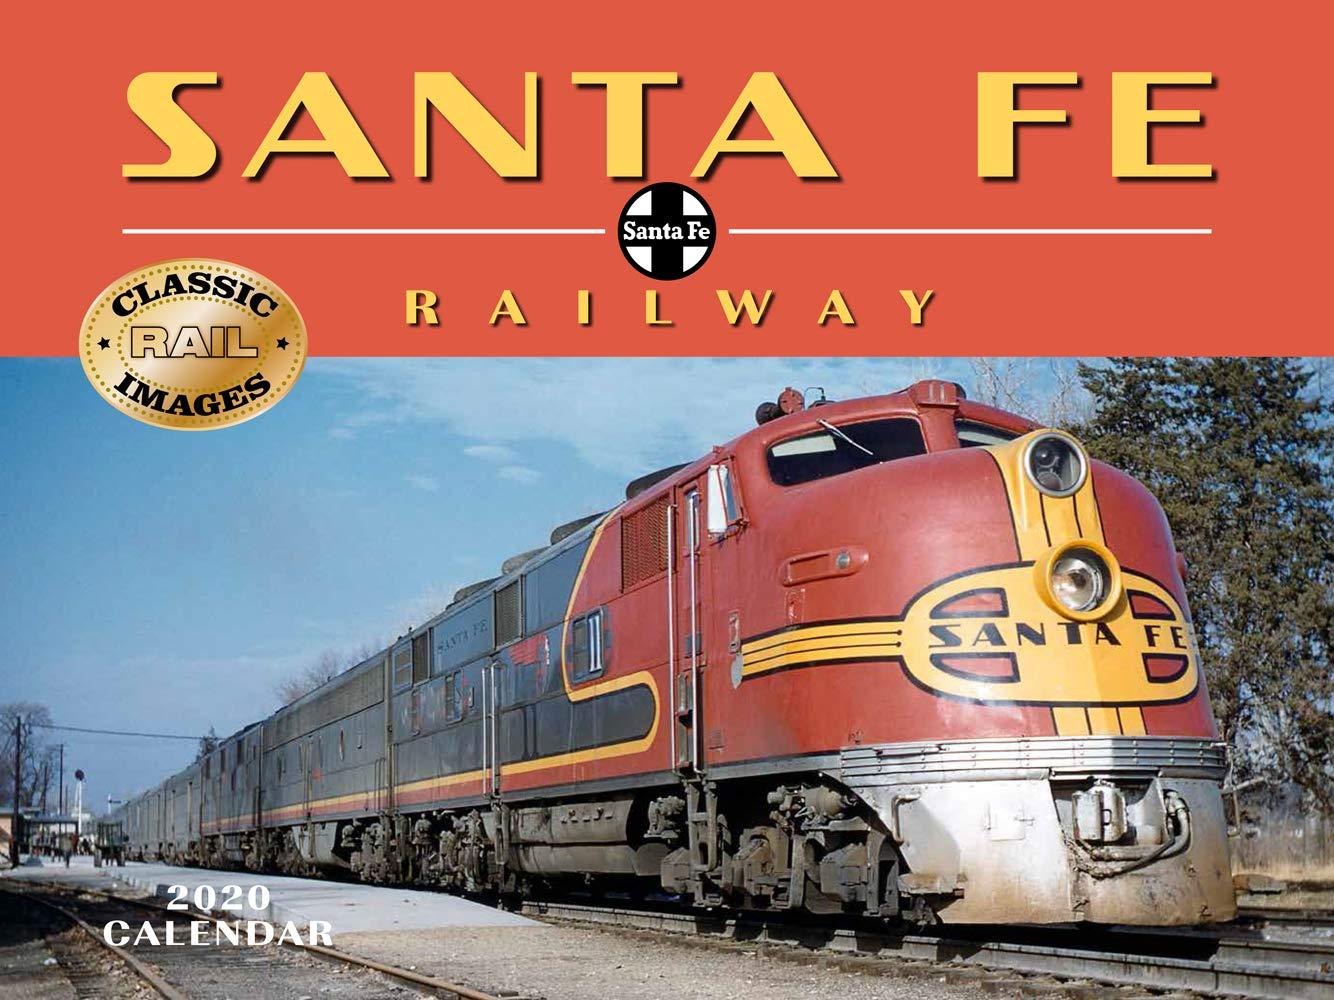 Santa Fe Calendar 2020 Santa Fe Railway 2020 Calendar: Tide mark: 9781631142642: Amazon